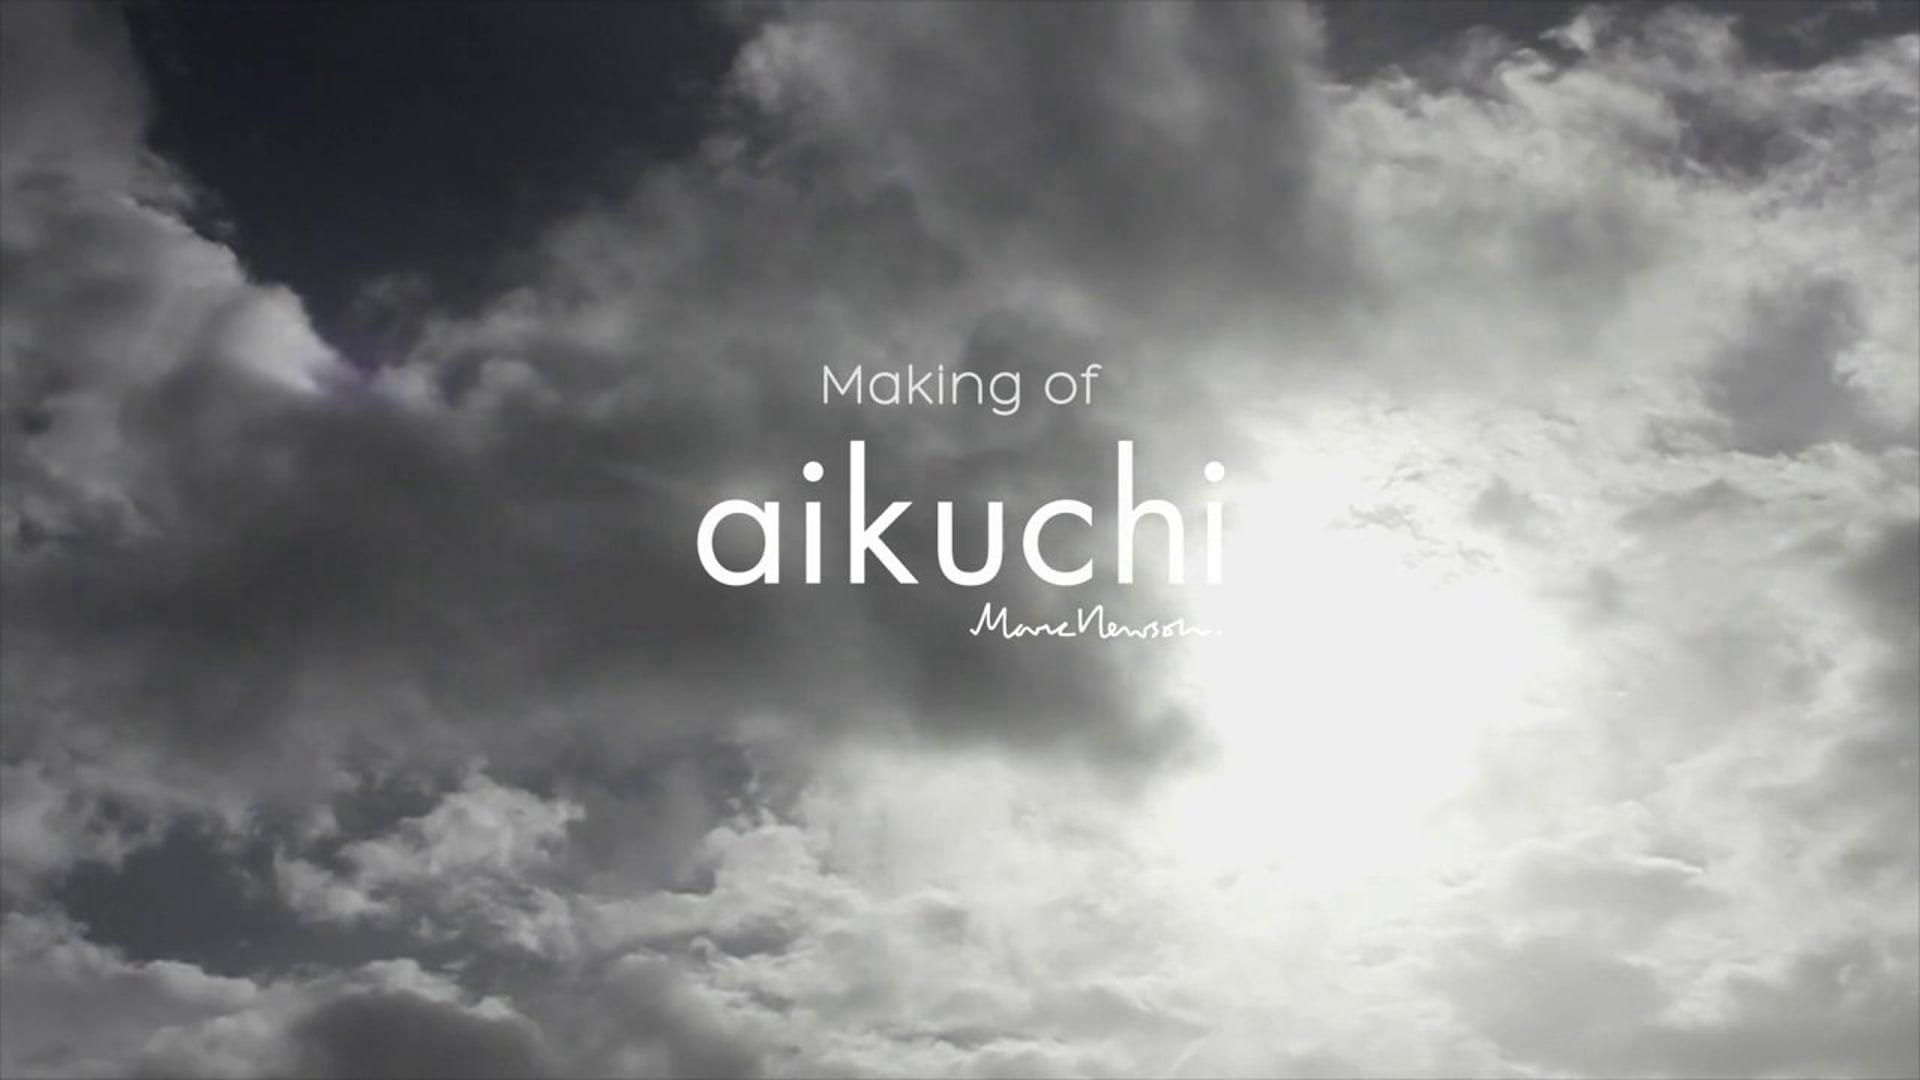 aikuchi - Making Movie